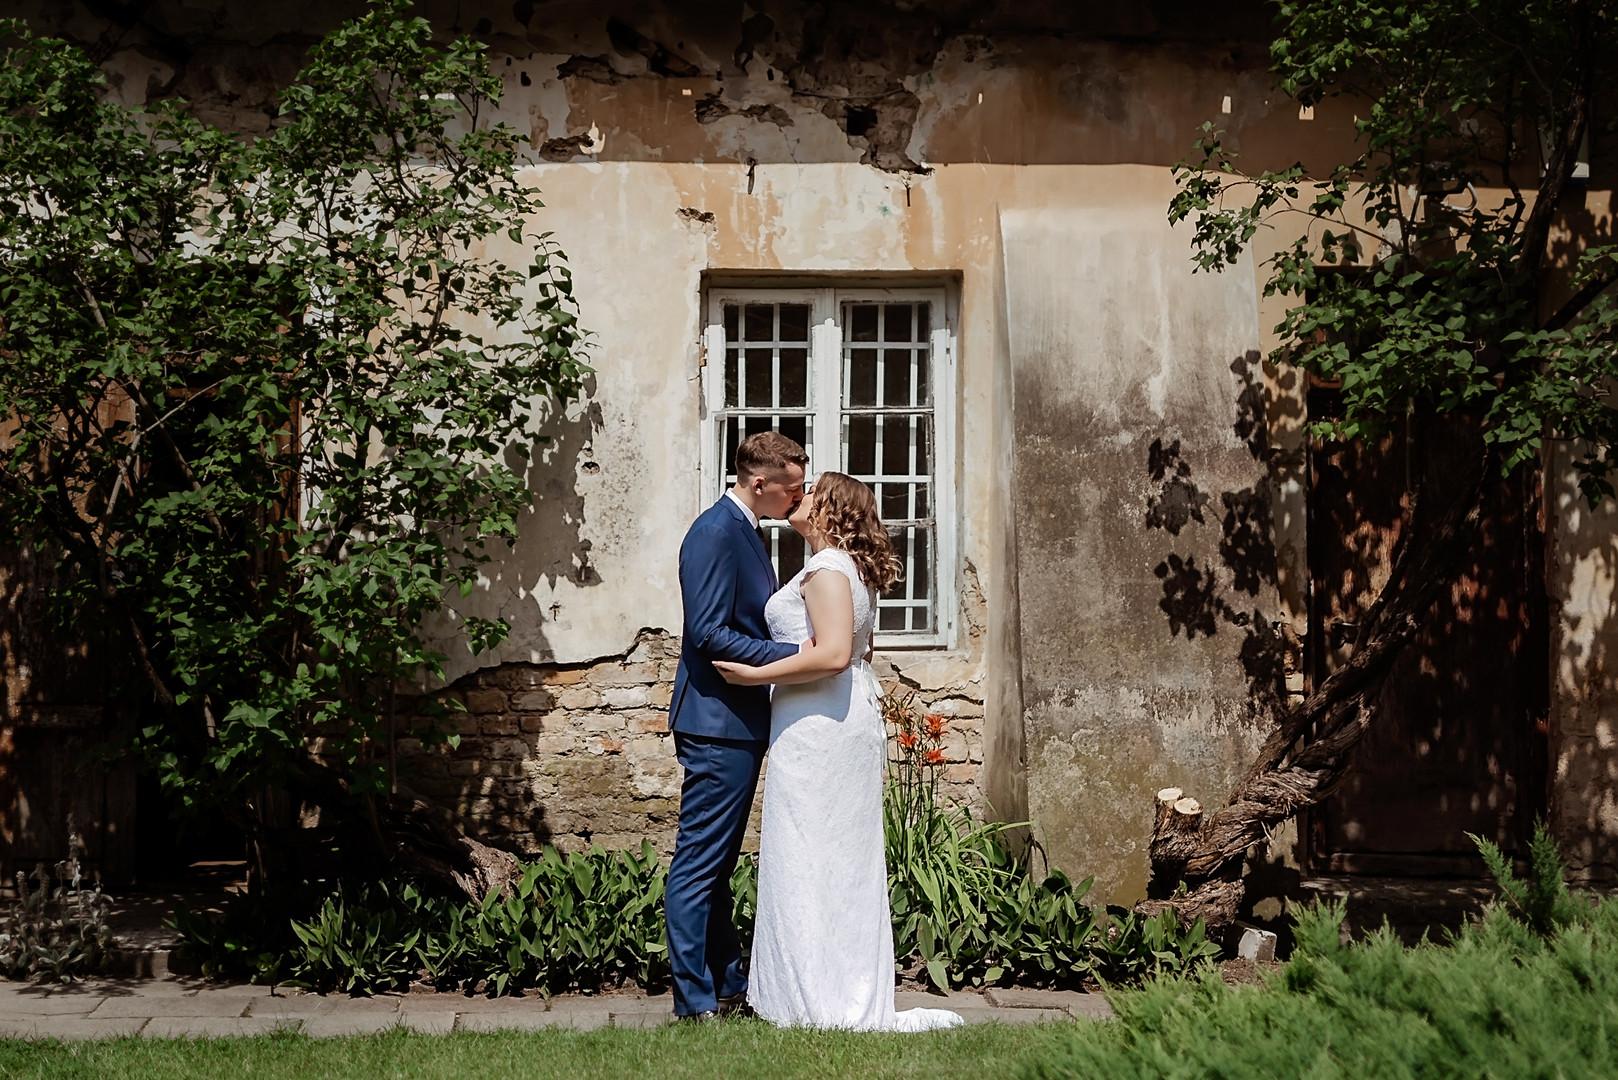 vestuvės-10.jpg